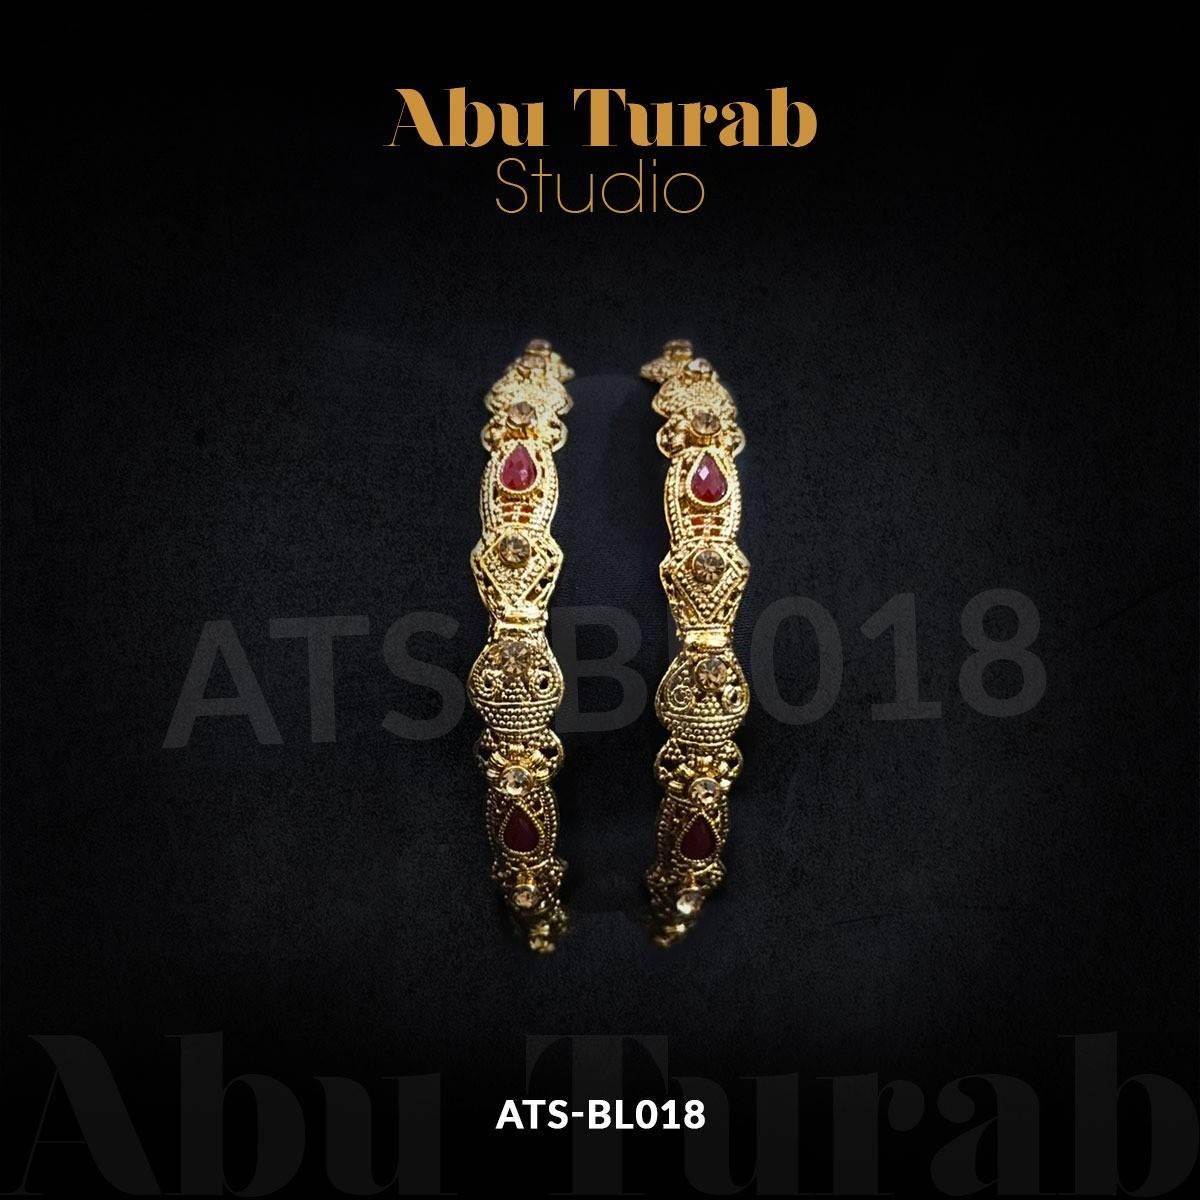 Abu Turab Studio - Golden Kundan Karray   Barat Bangles Set With Maroon Stones and Meenakari Work   Wedding Bangles Set (2 pieces)